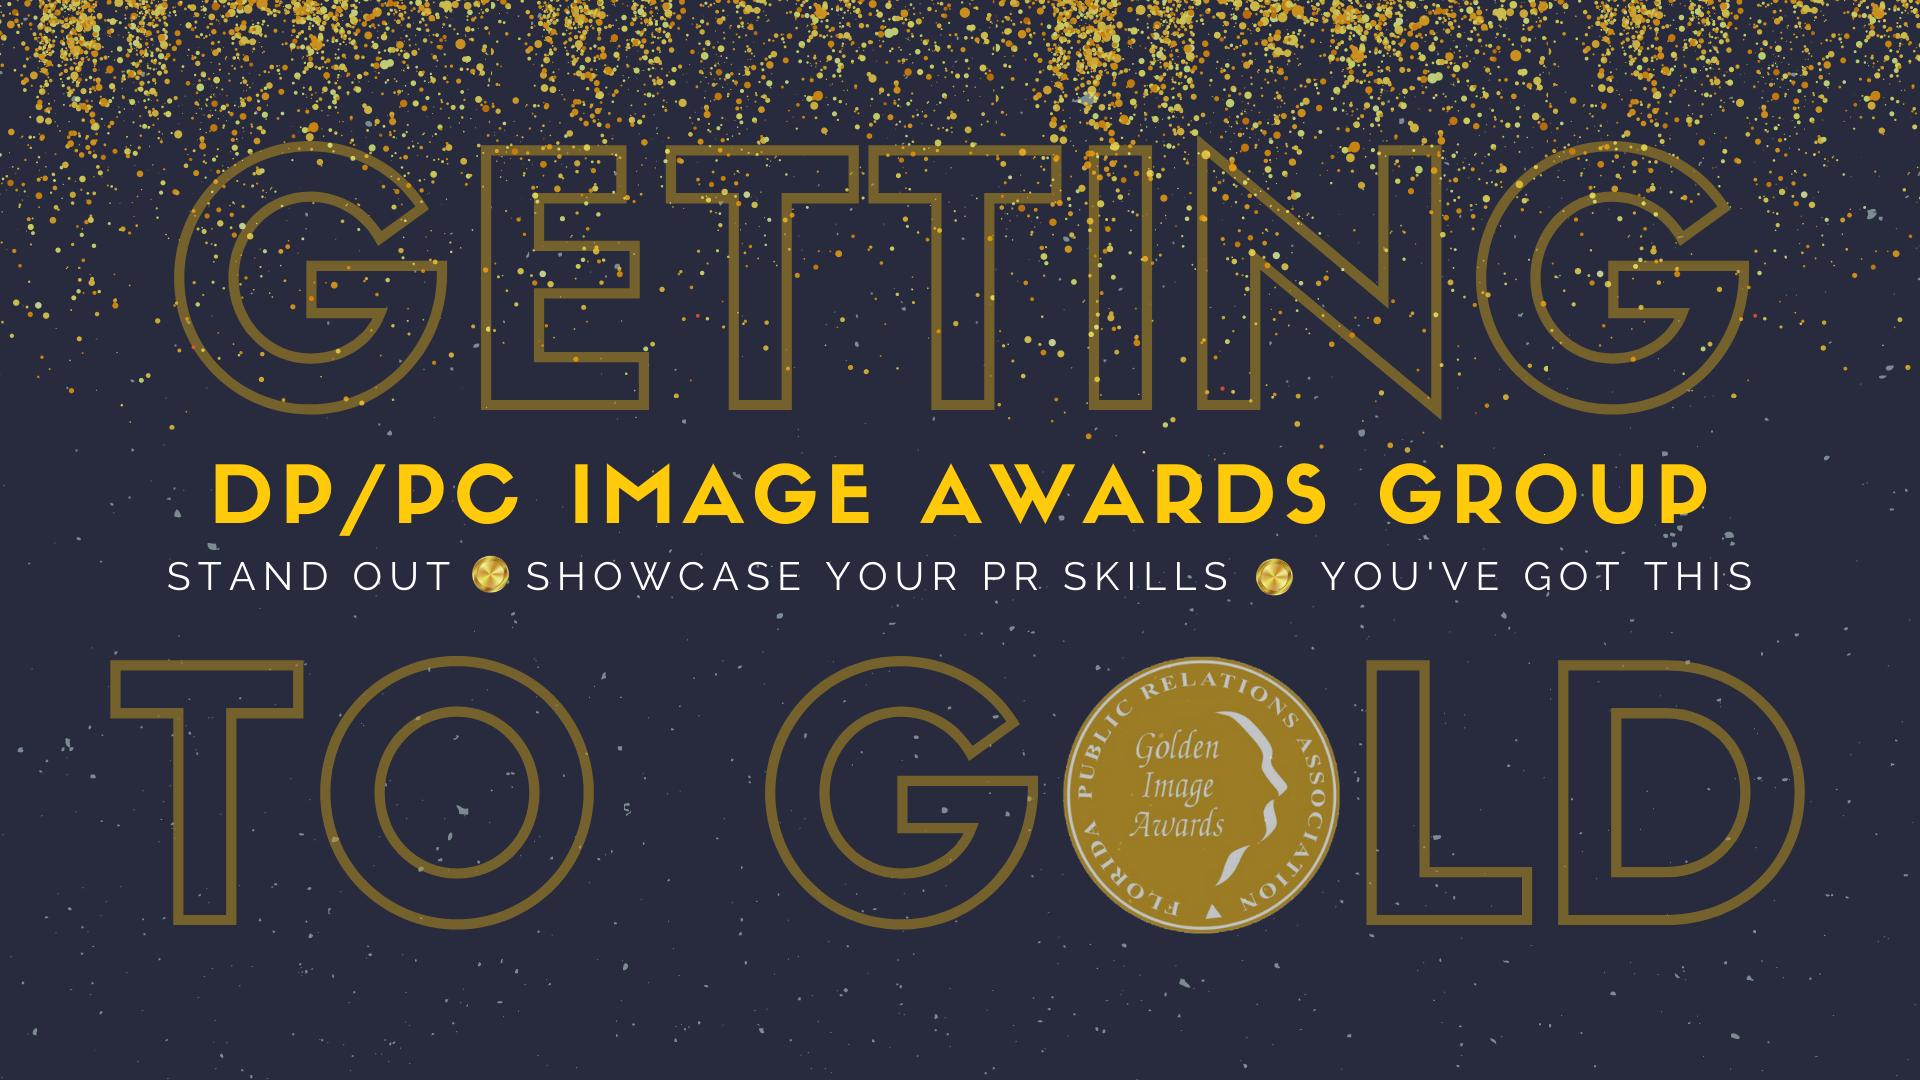 Awards Group banner